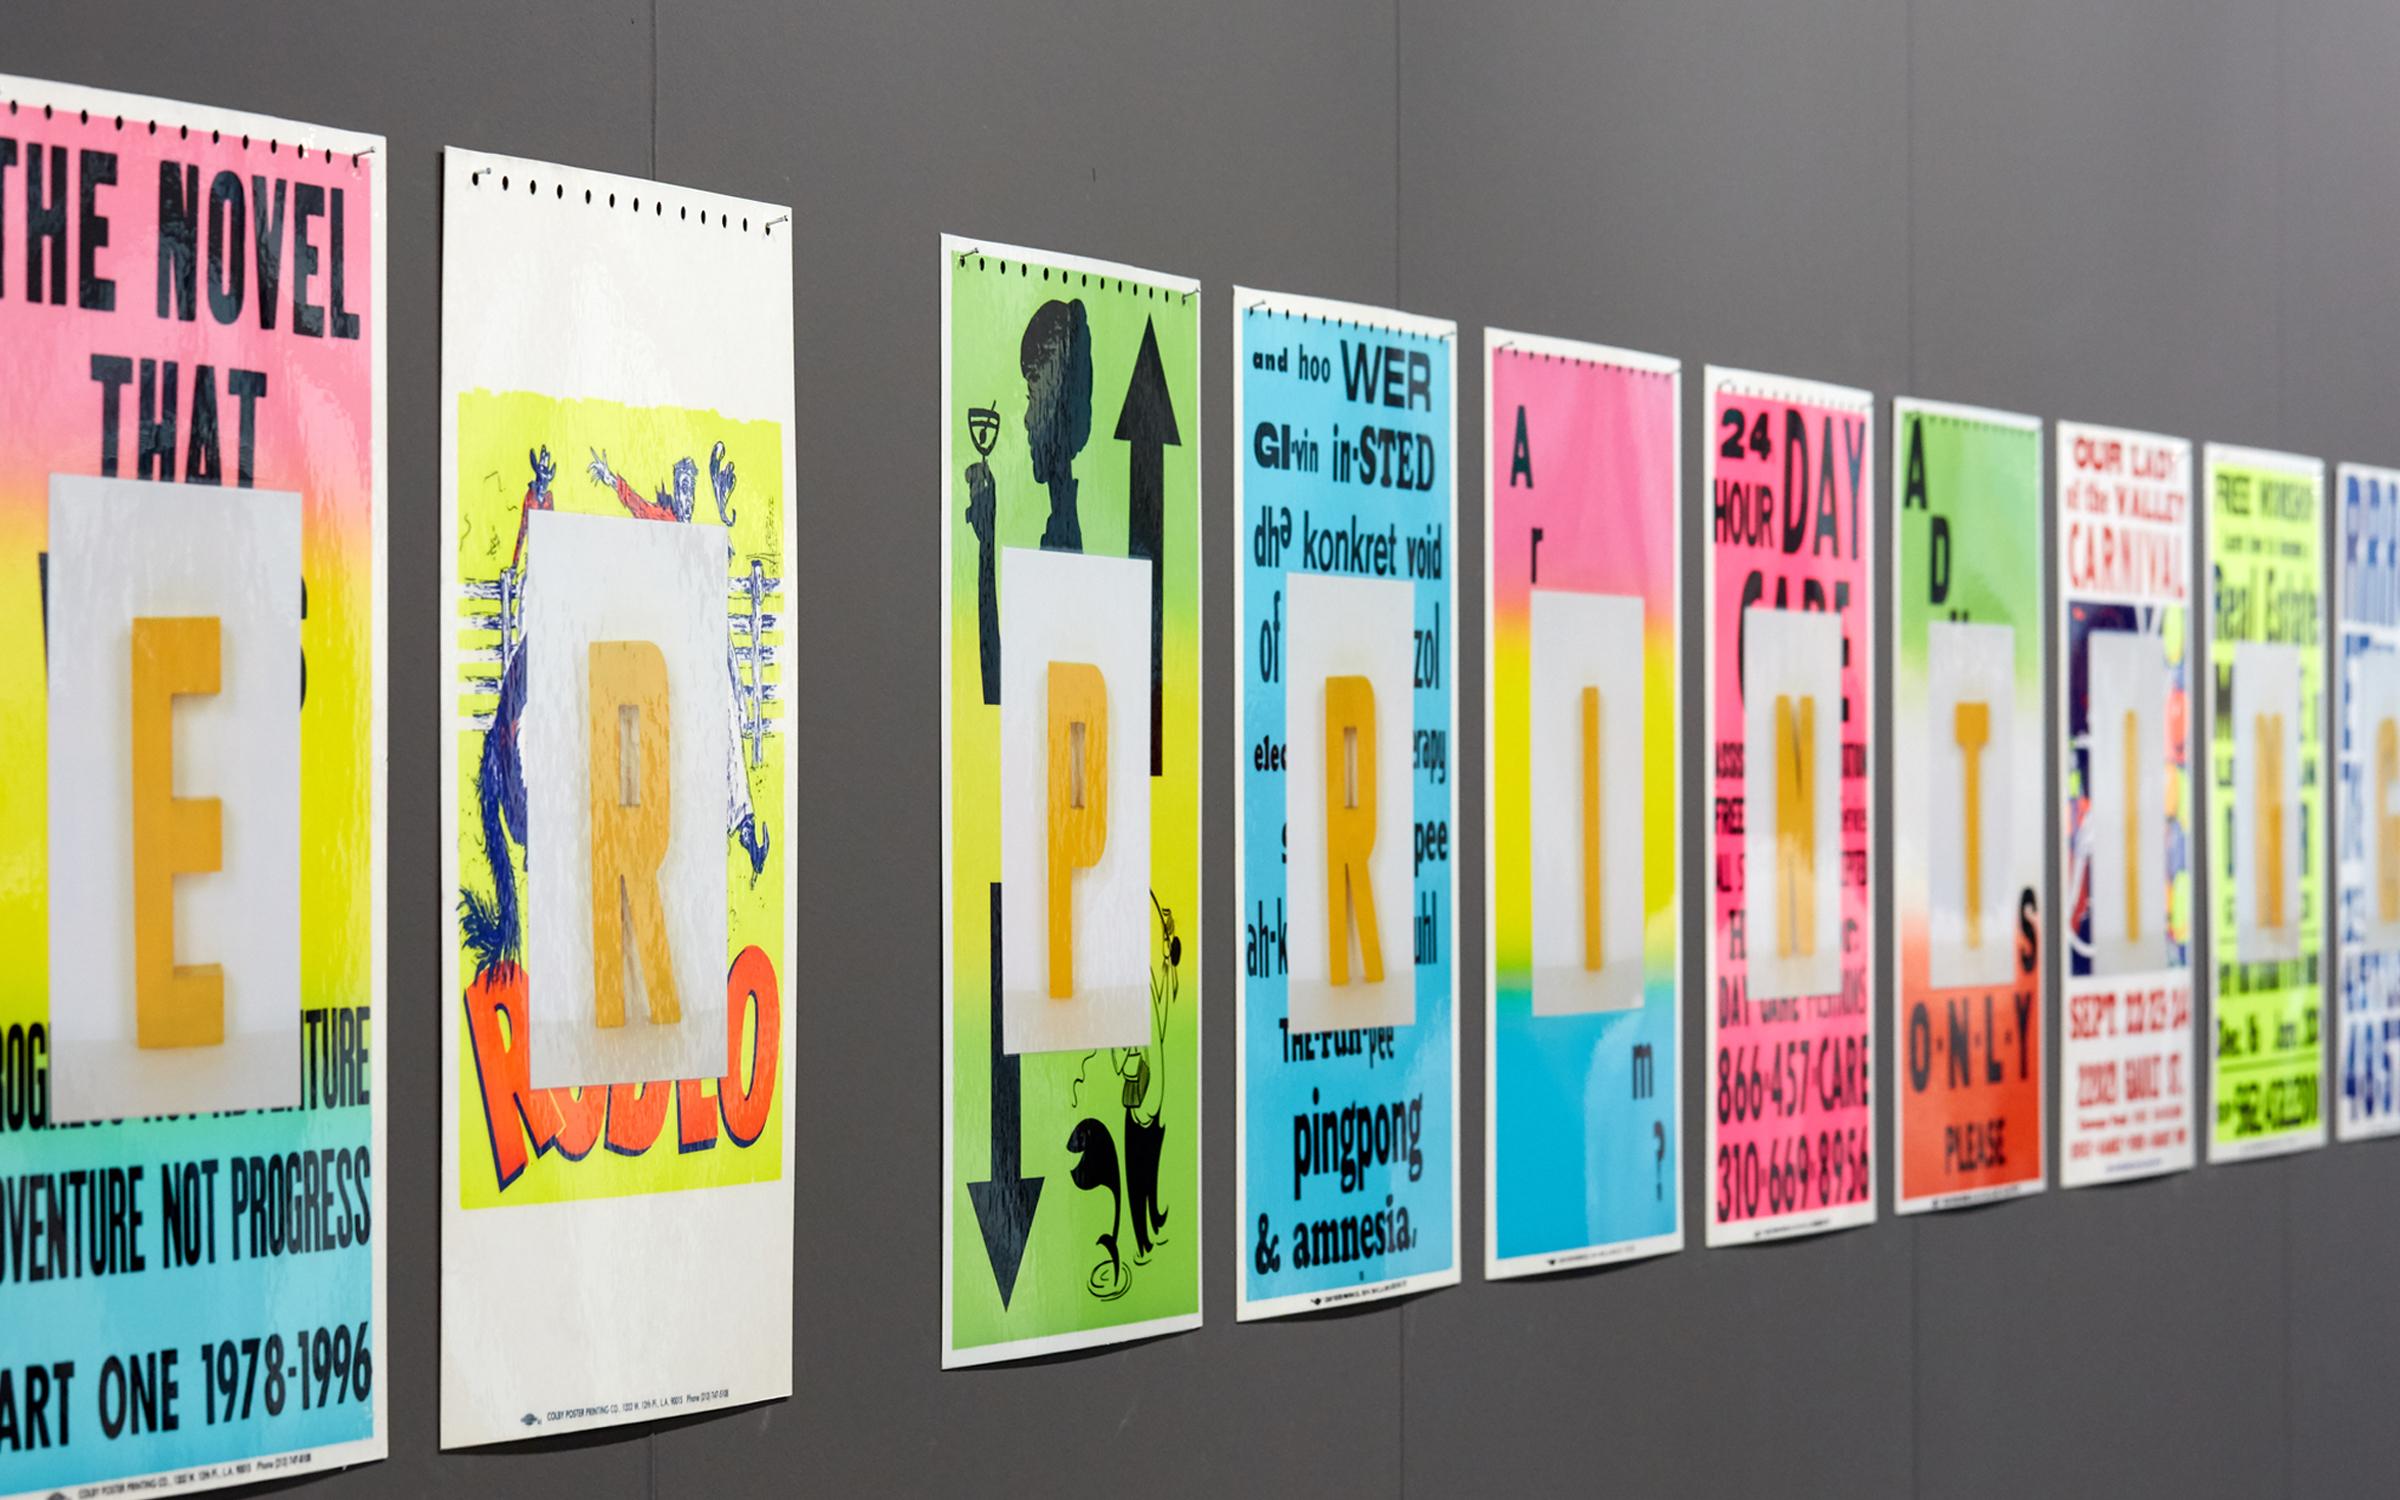 Art Basel's show in Basel